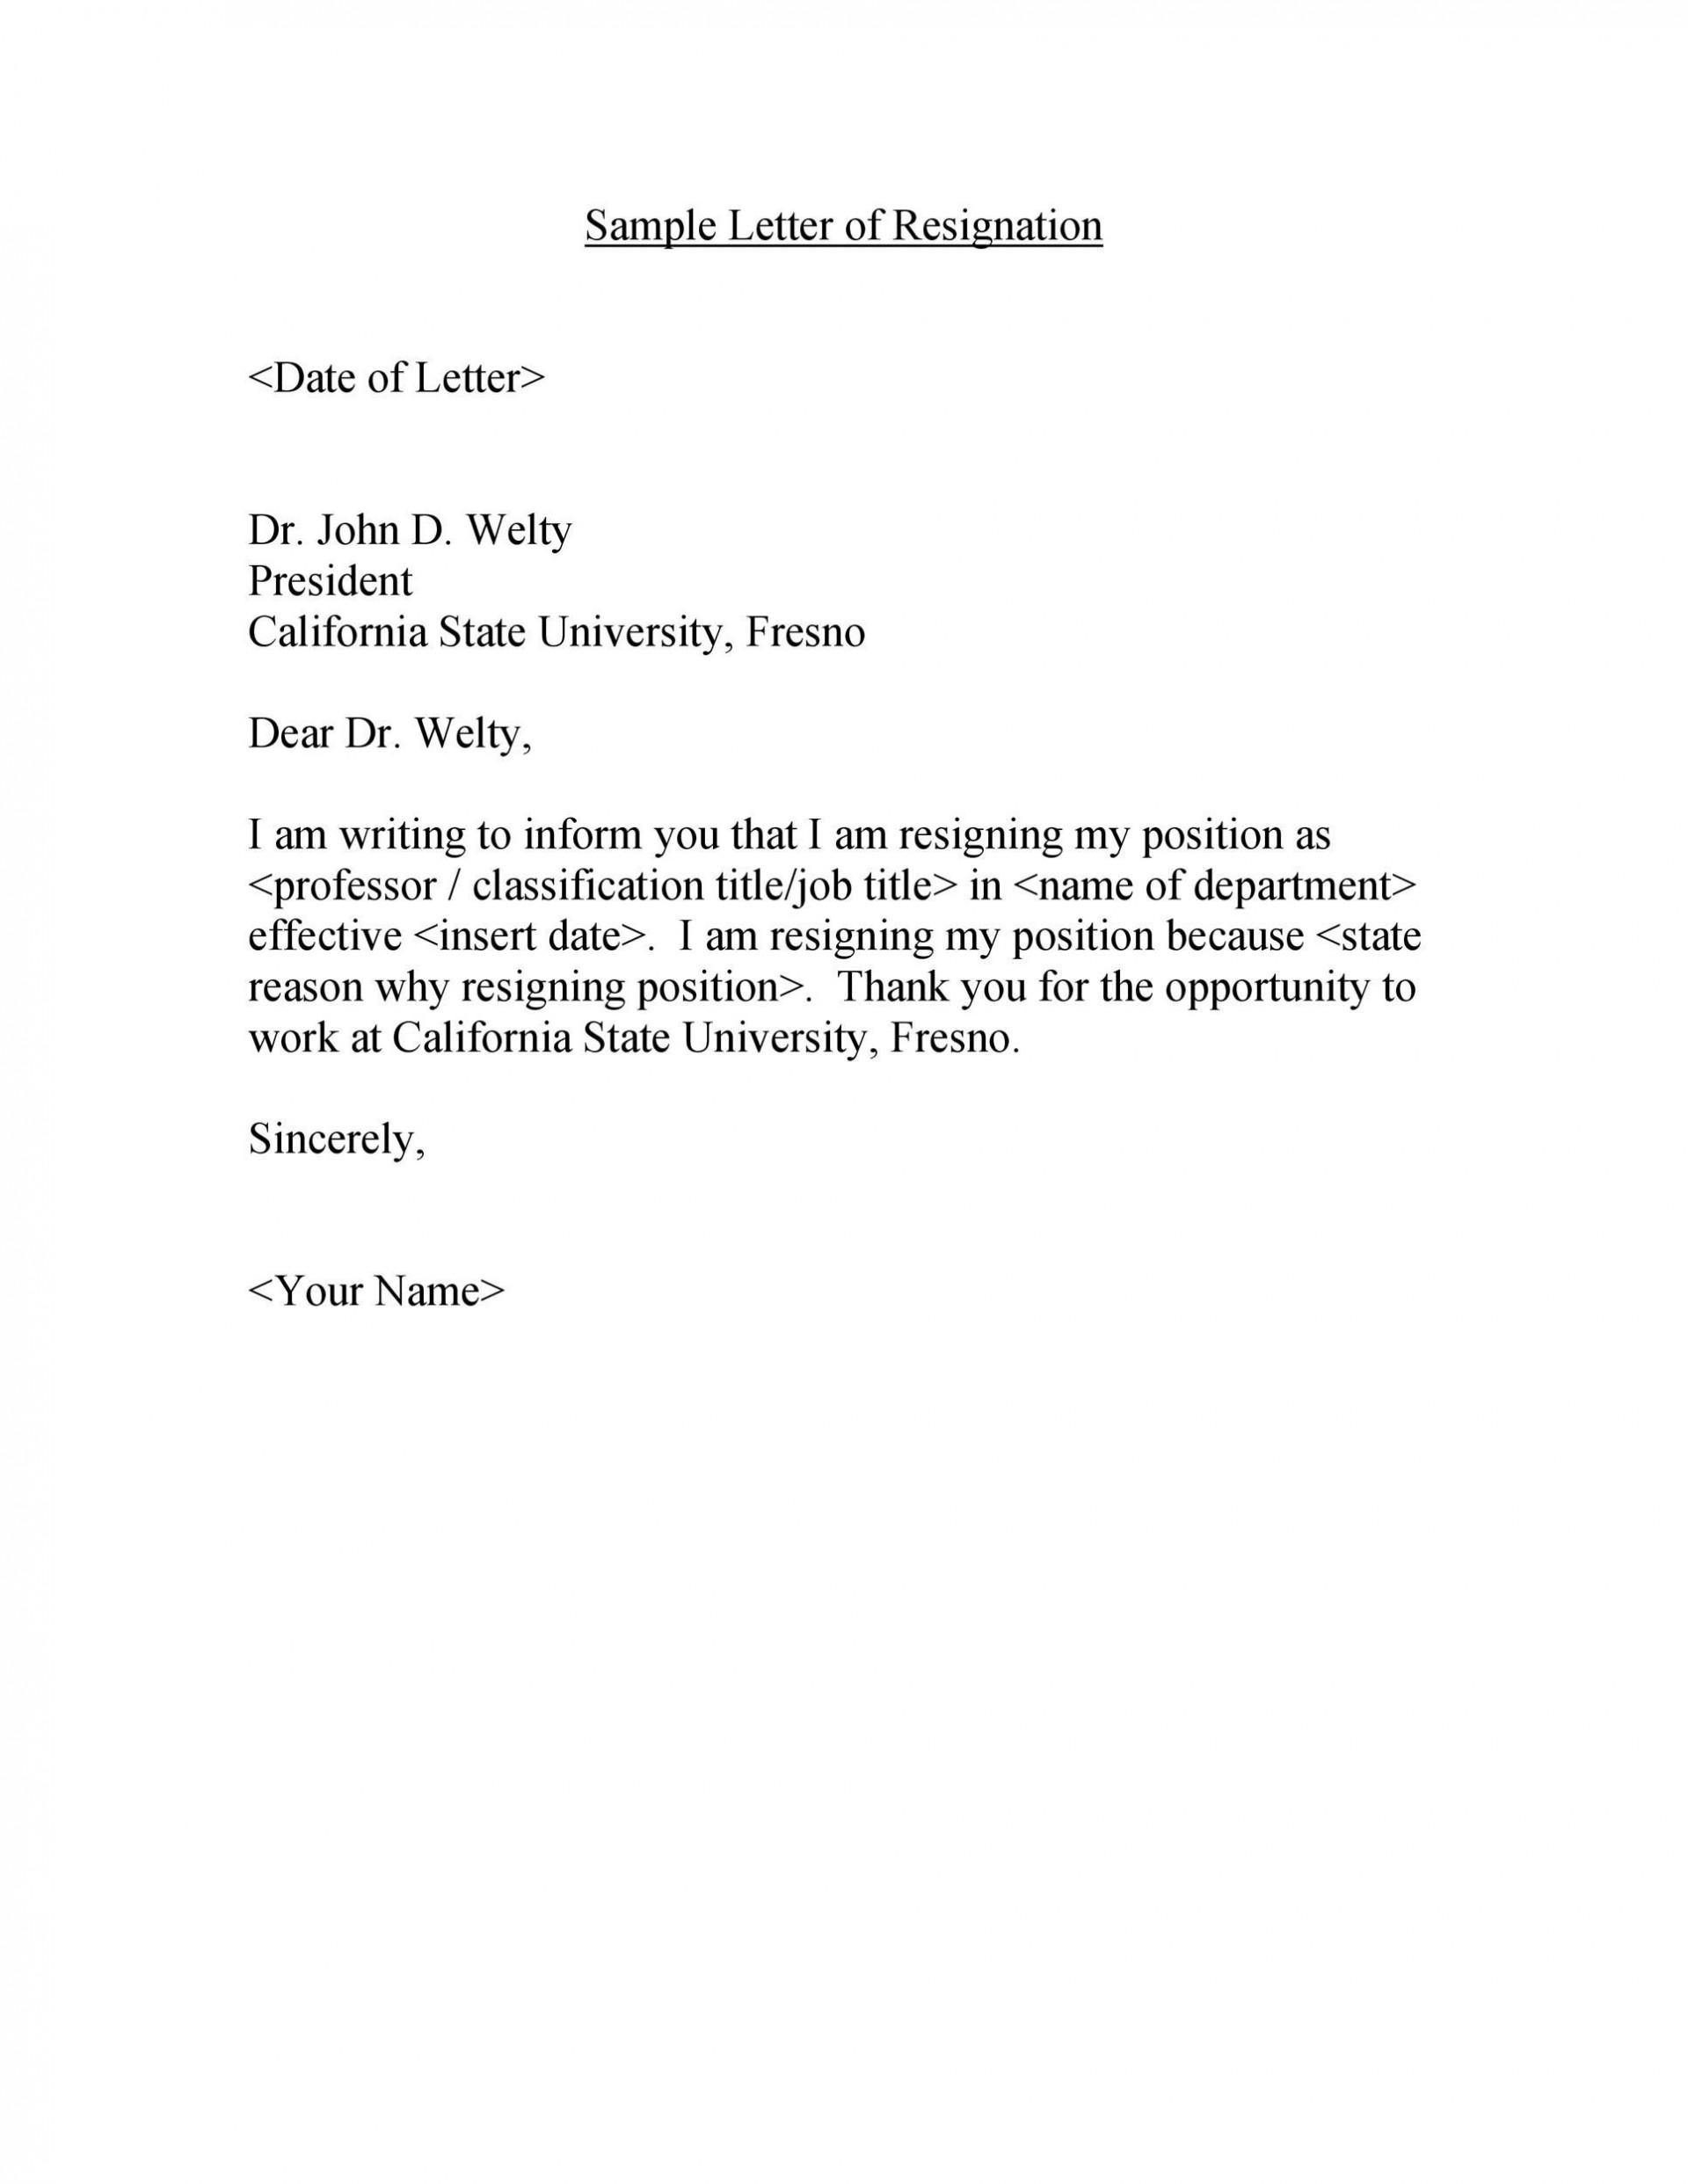 008 Sensational Sample Resignation Letter Template Inspiration  For Teacher Word - Free Downloadable1920